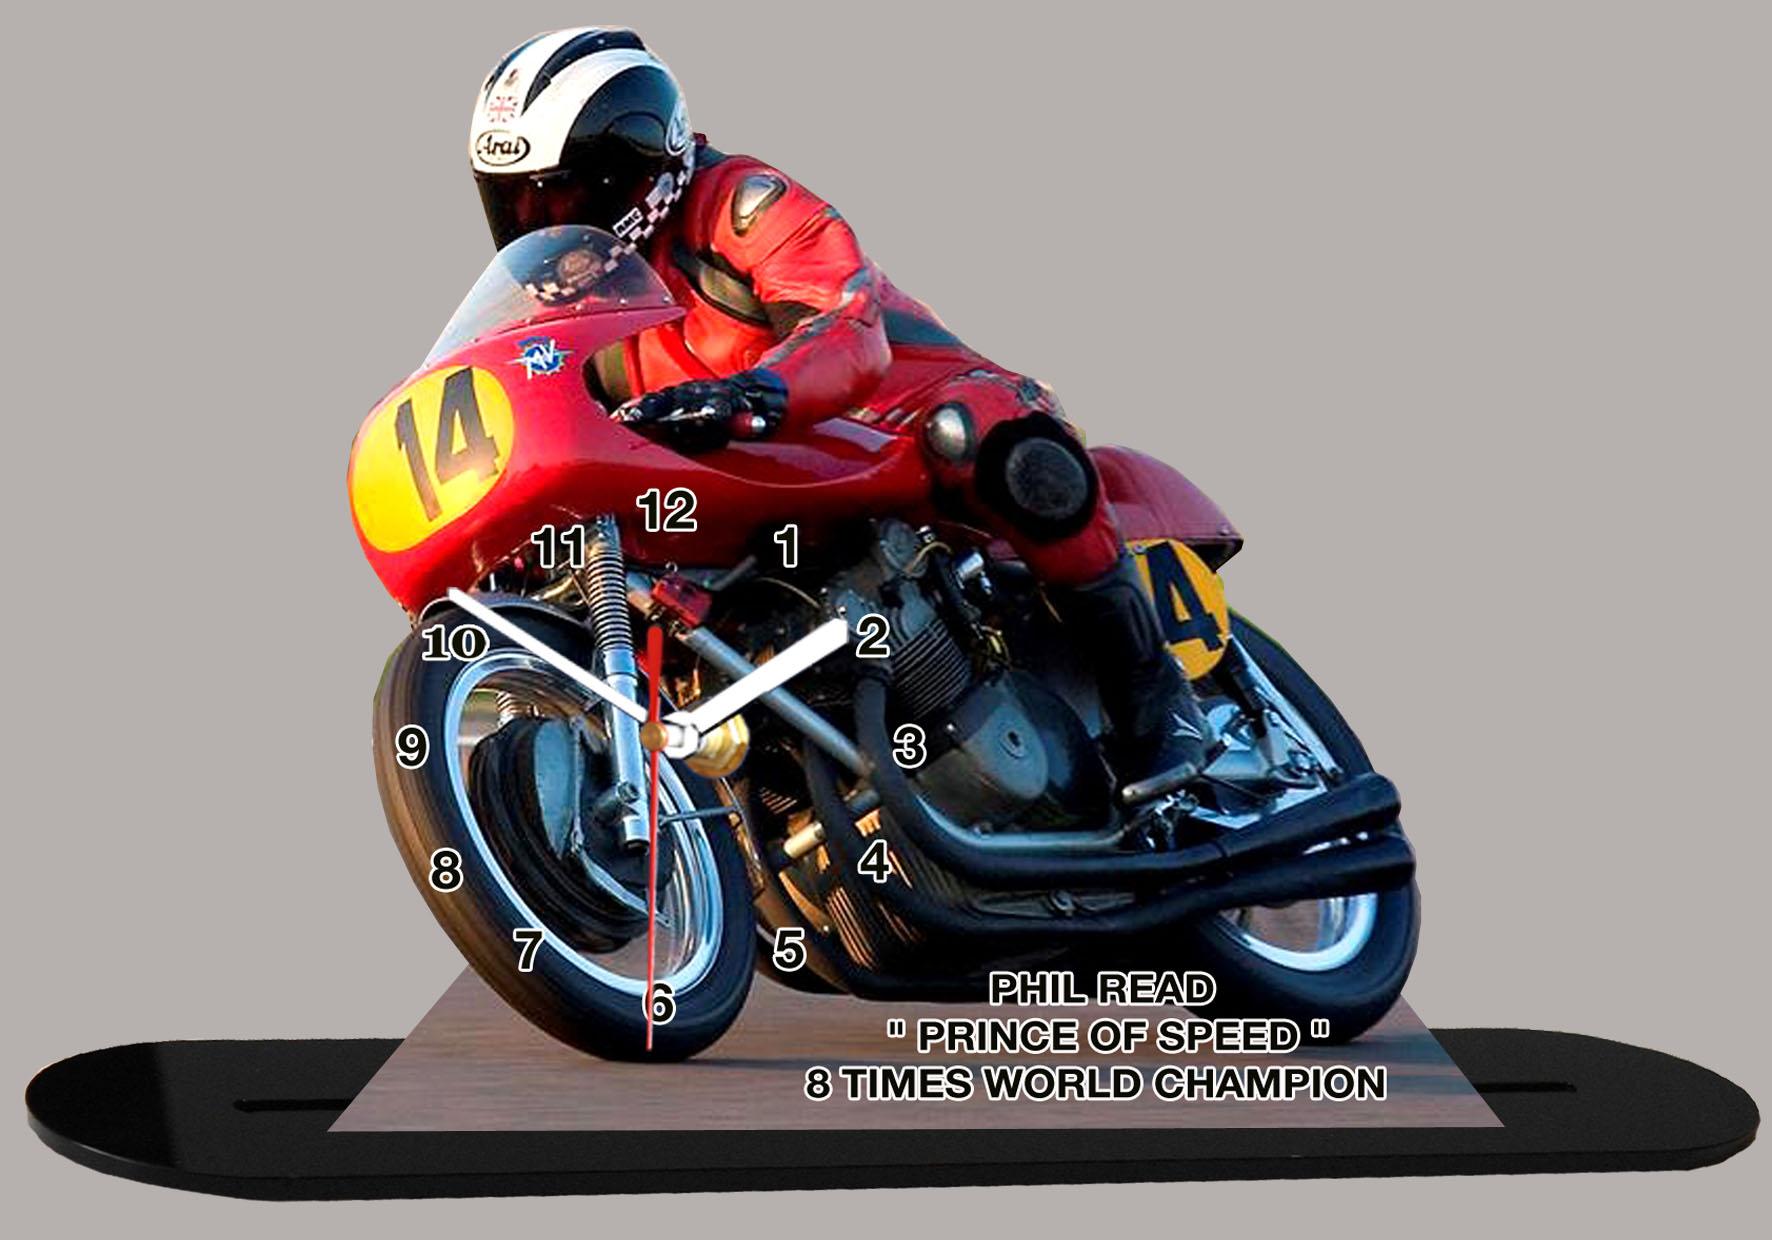 phil read pilote moto honda en miniature moto horloge. Black Bedroom Furniture Sets. Home Design Ideas